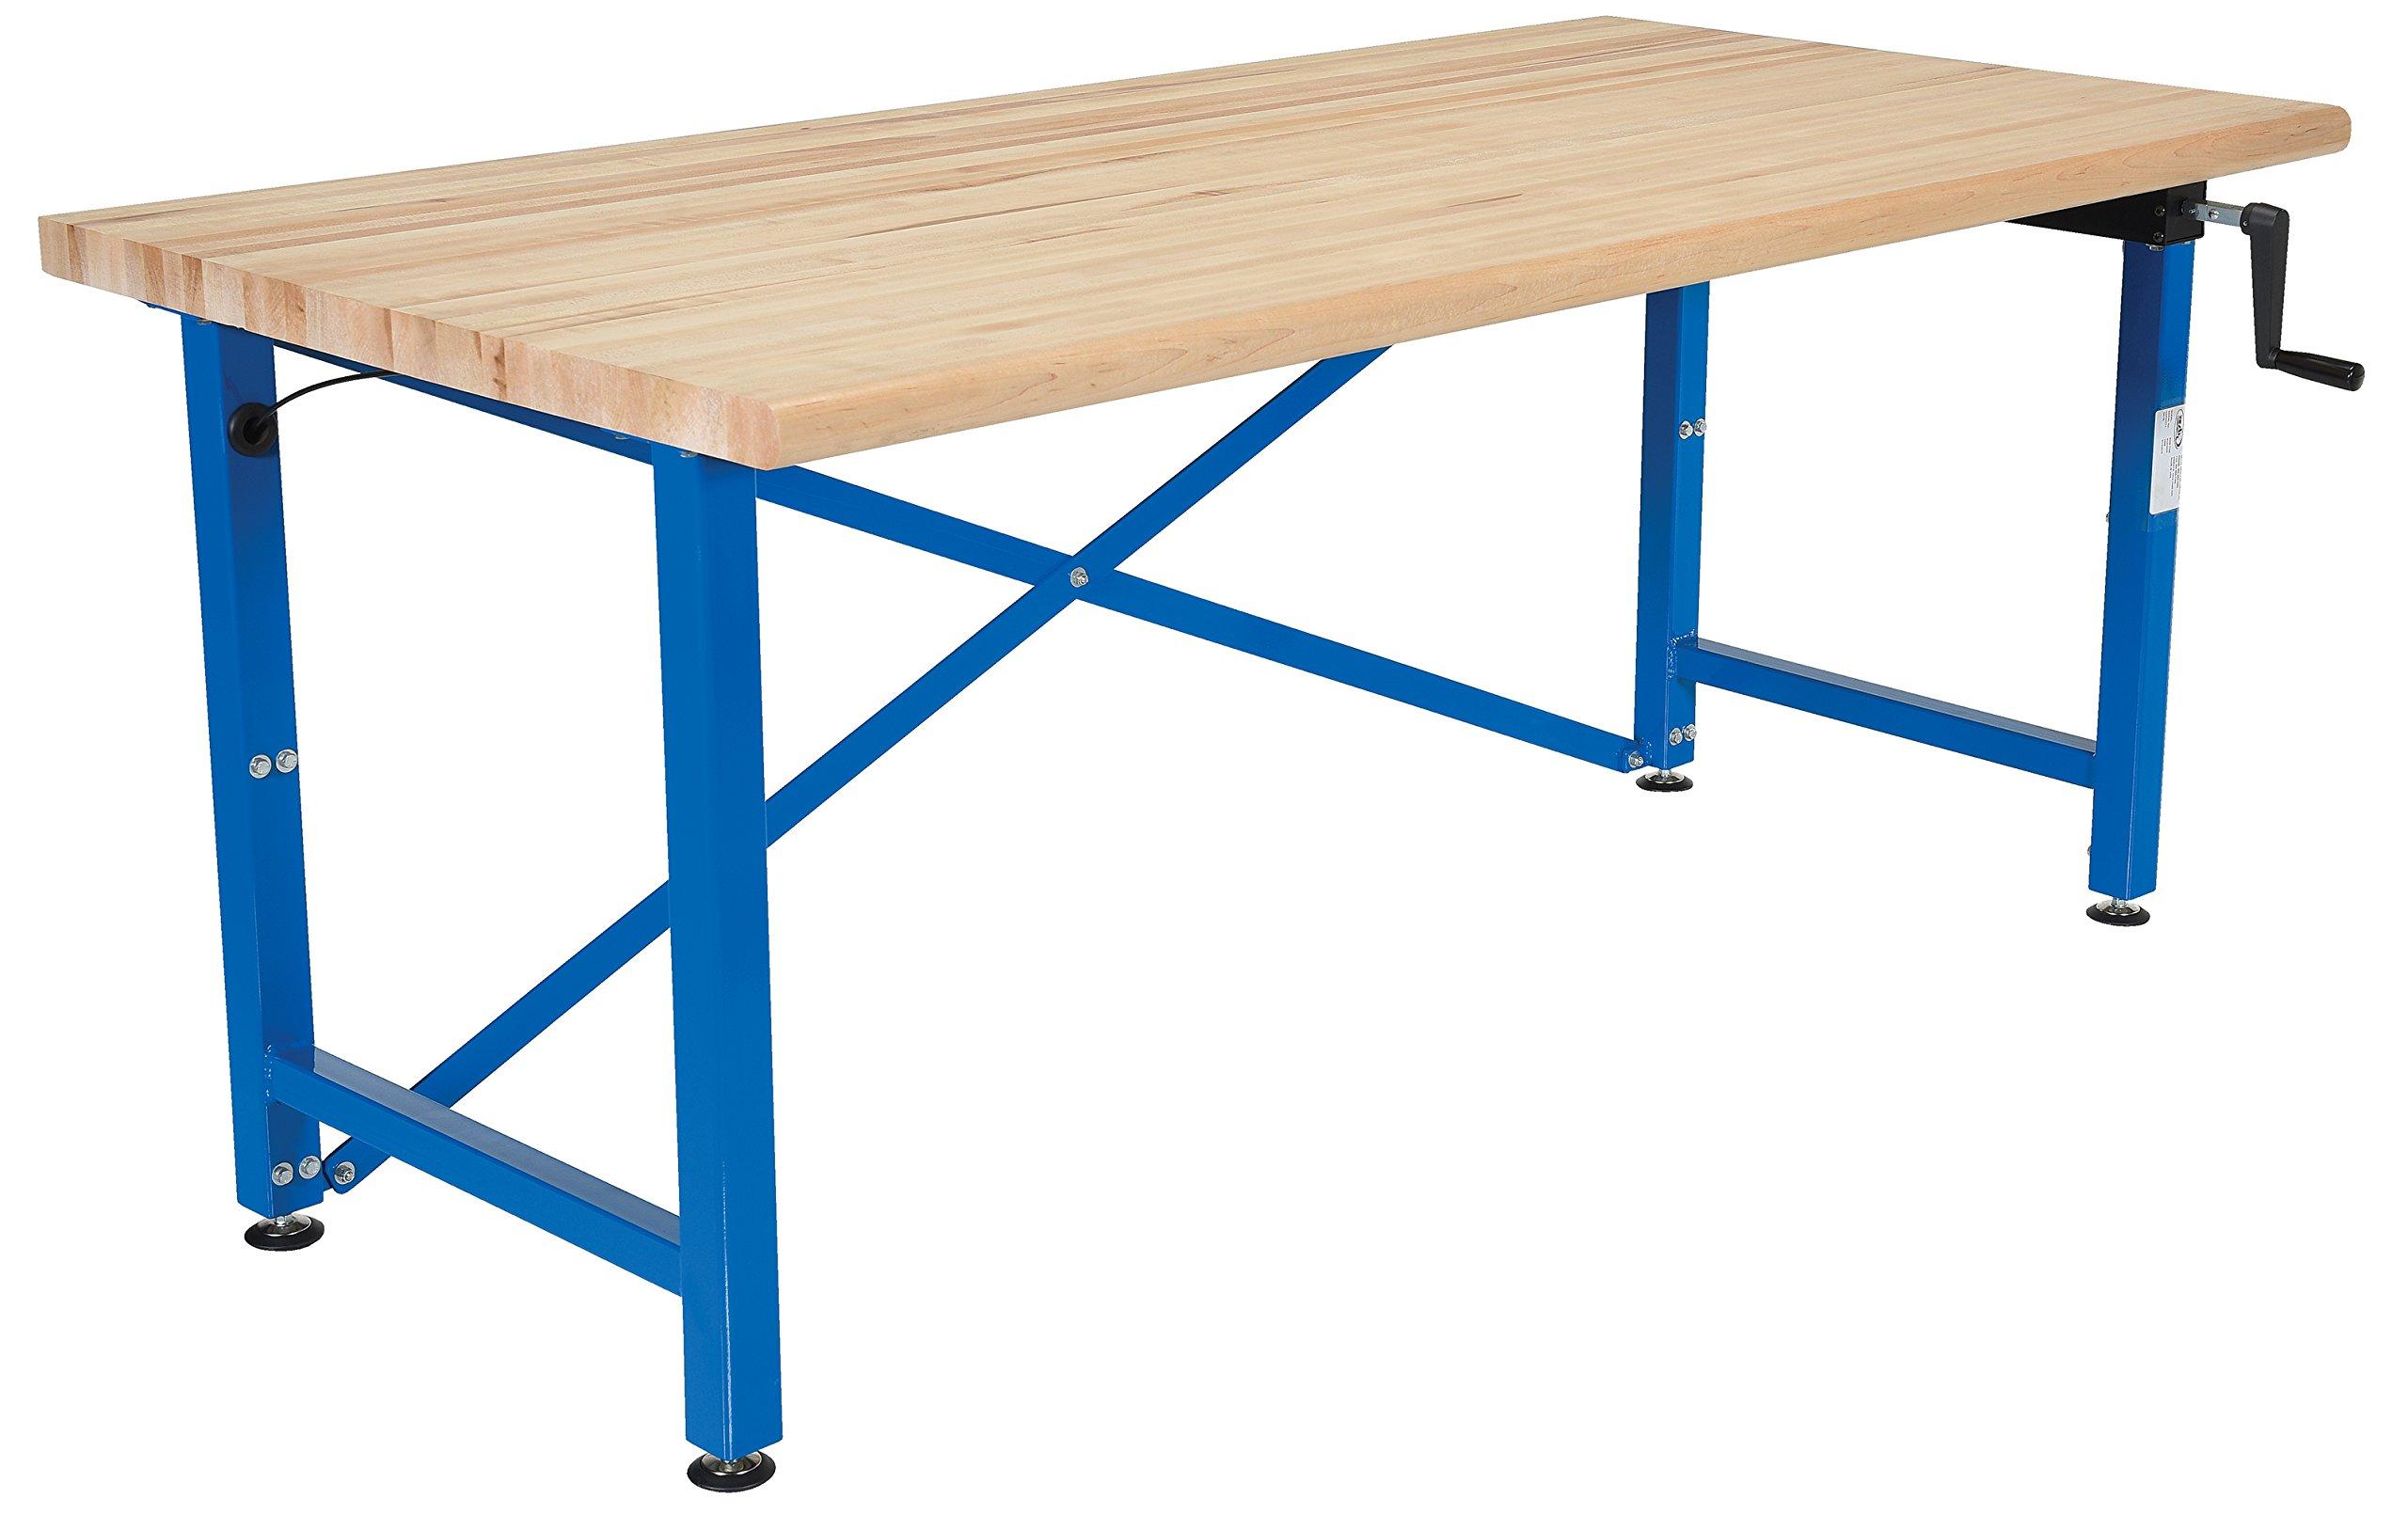 Vestil EWB-7236 Manually Adjustable Ergonomic Work Bench, 72'' x 36'', Blue/Tan